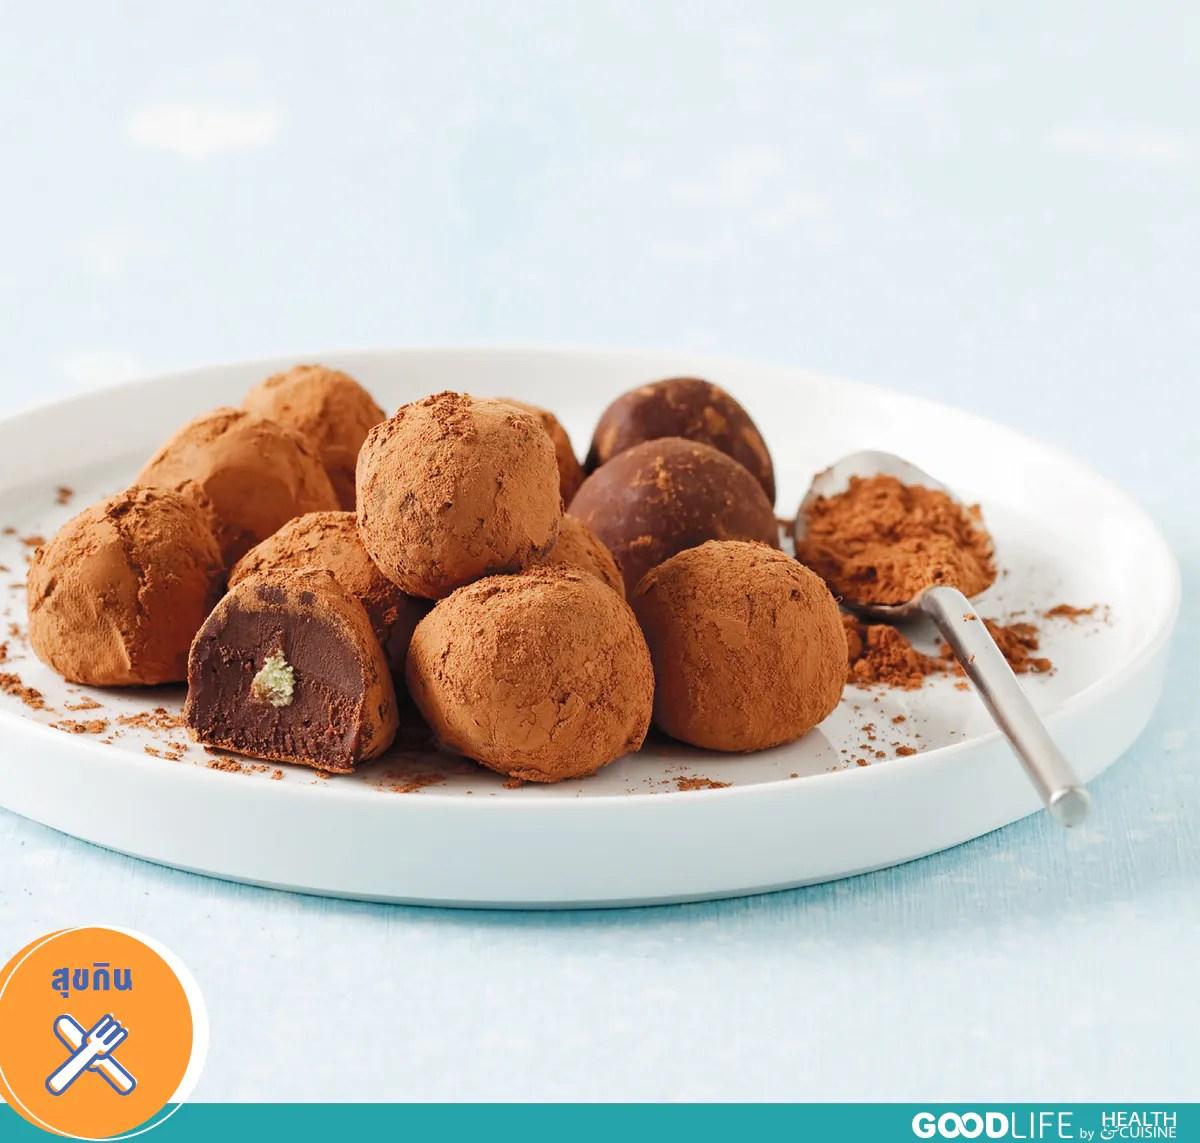 Wasabi Chocolate Truffle